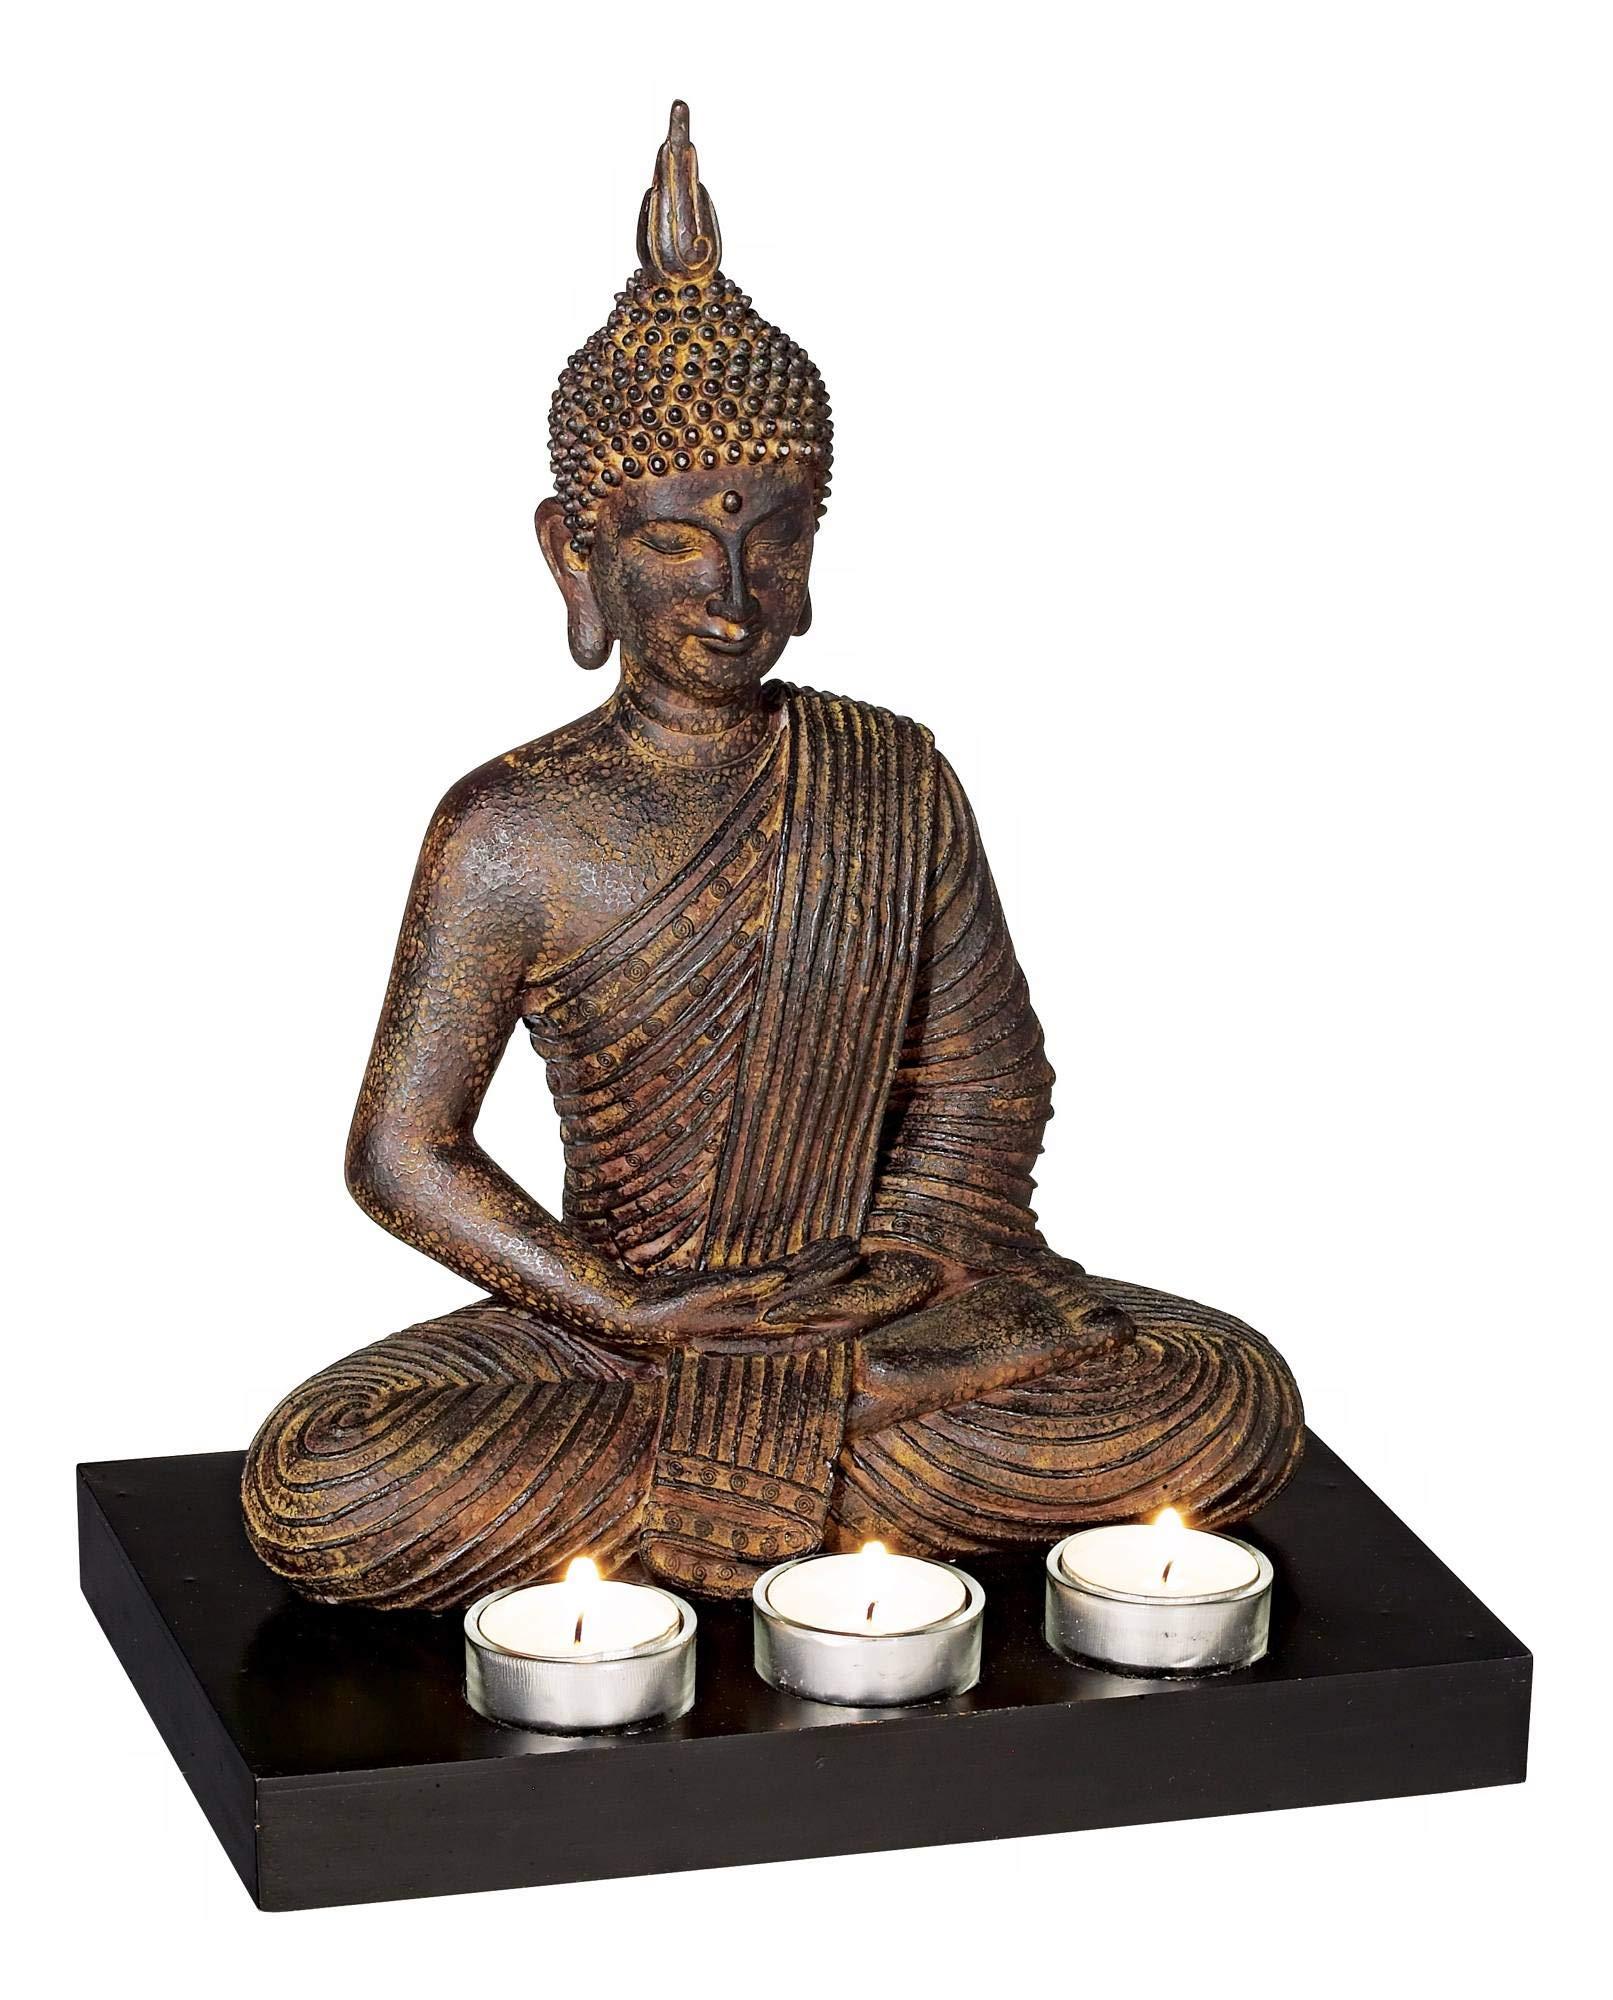 Kensington Hill Sitting Buddha 12 3/4'' High 3-Candle Tealight Holder